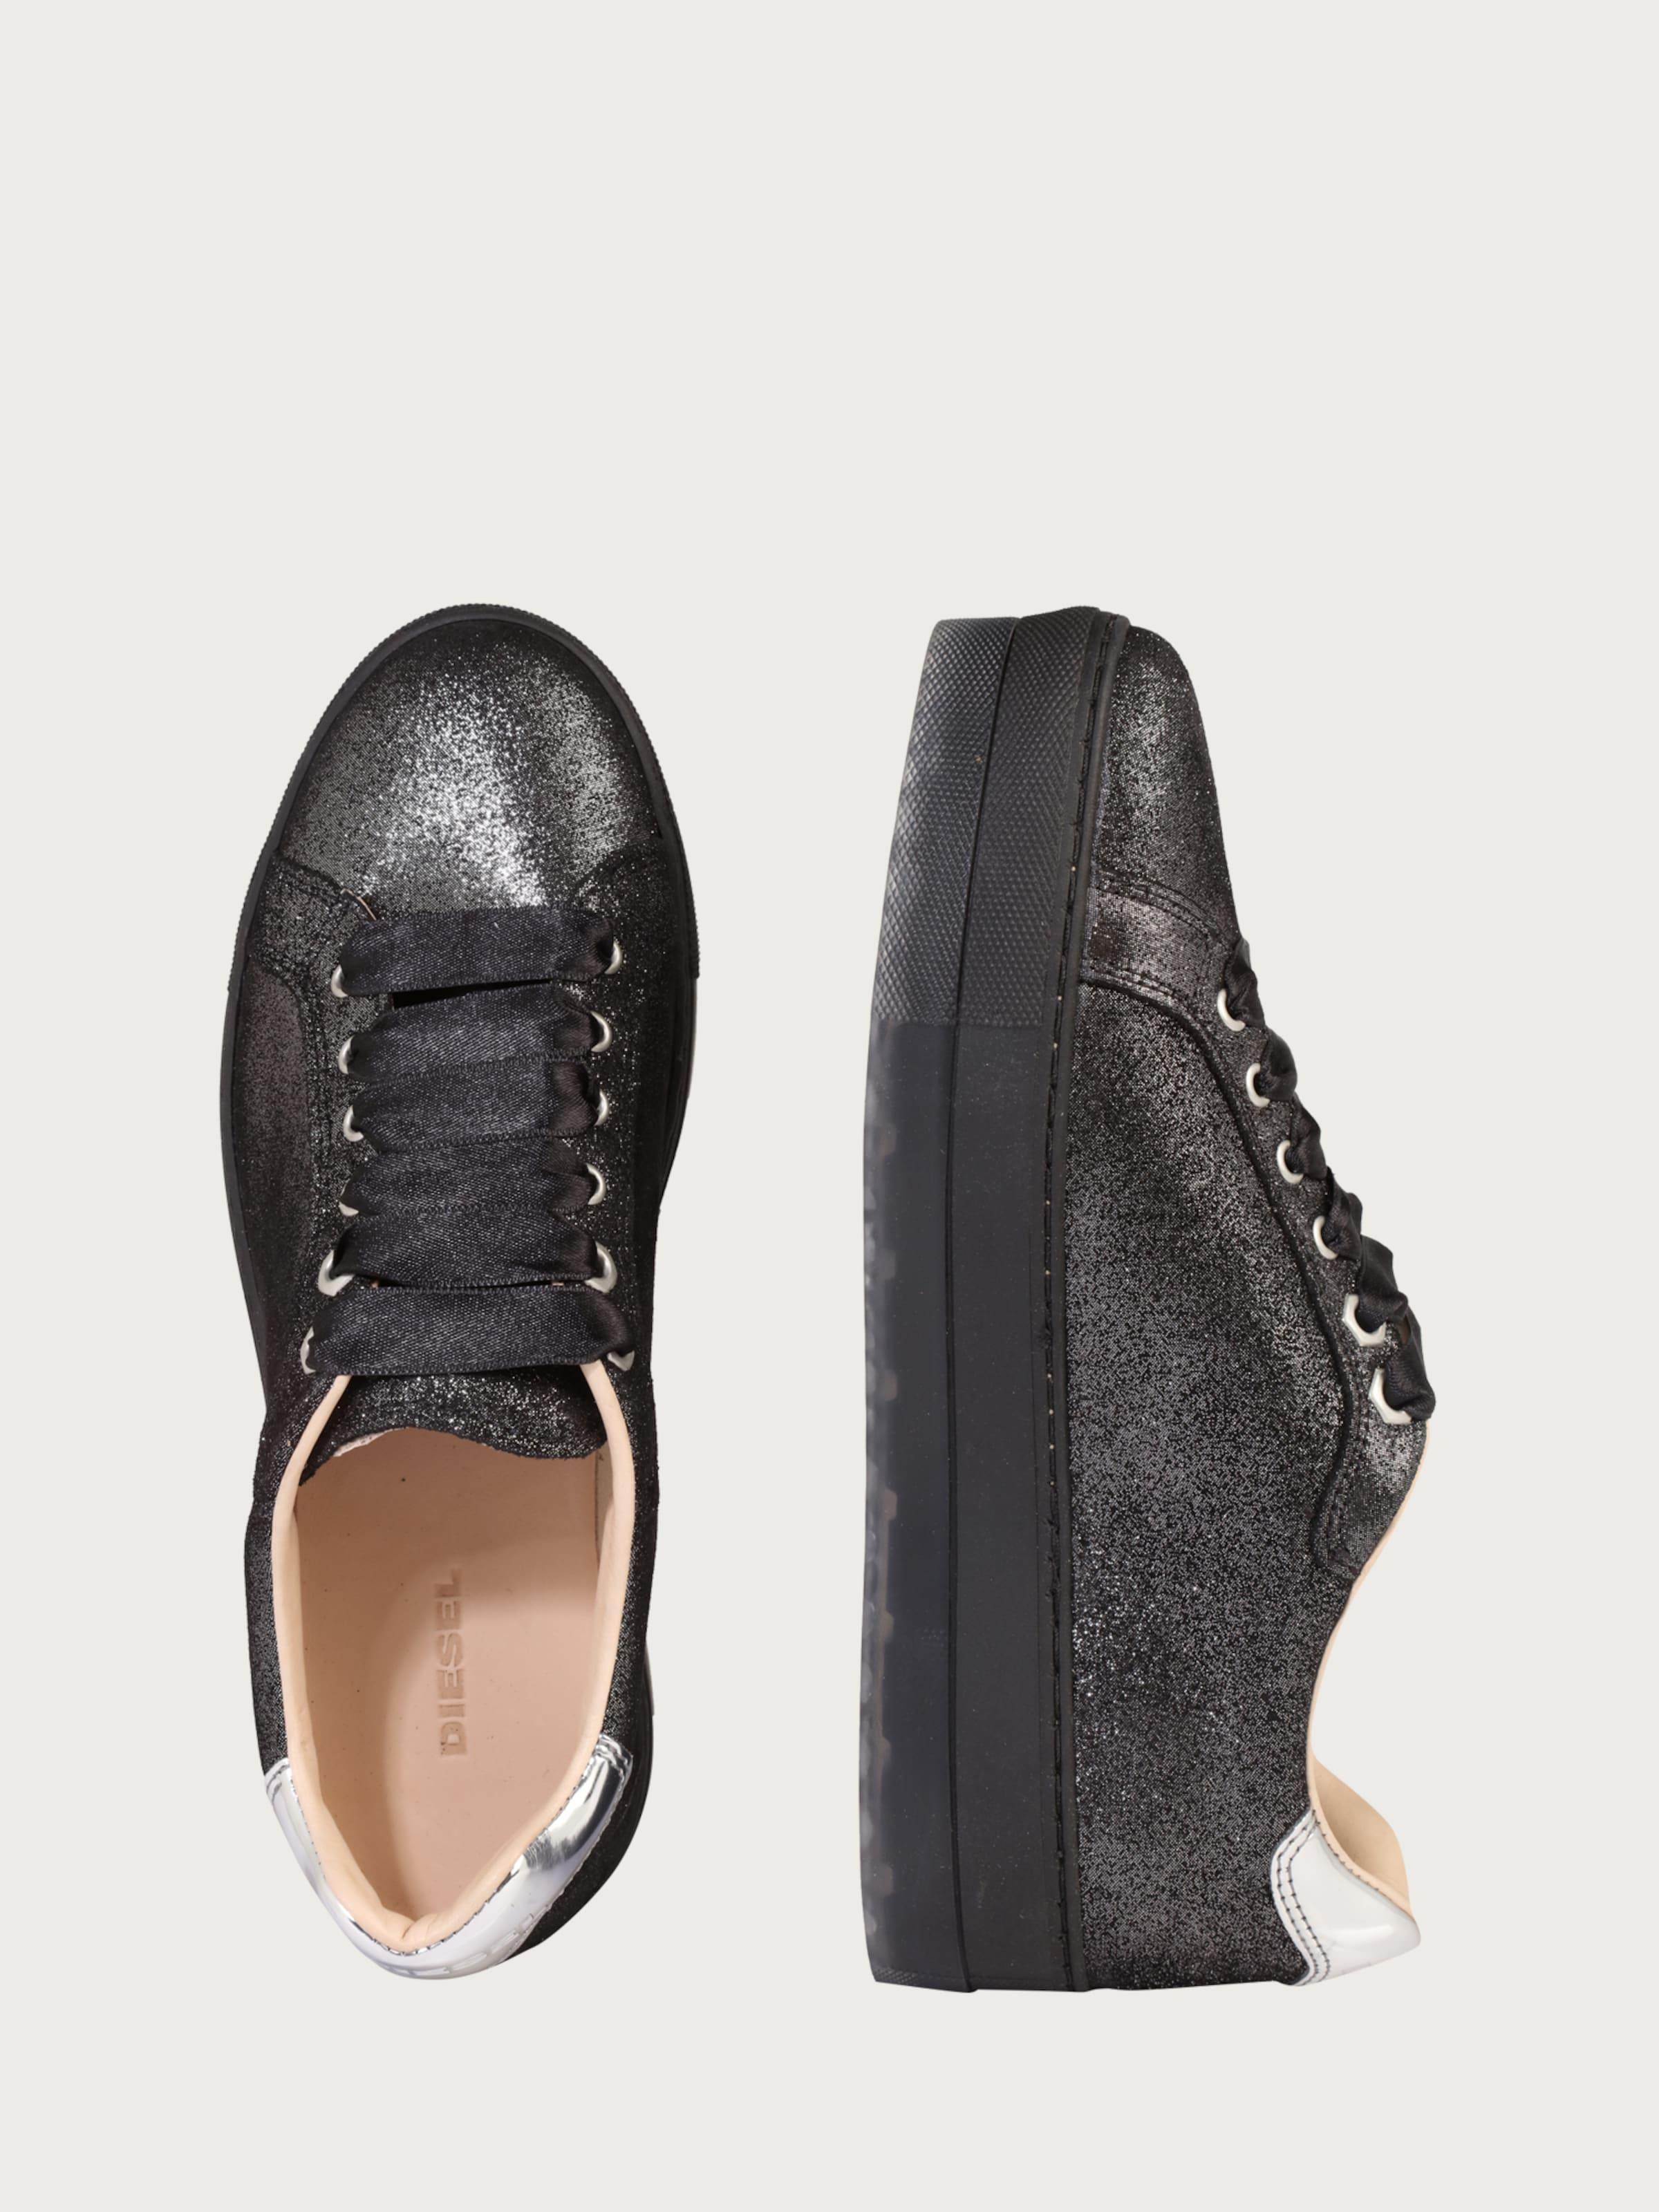 DIESEL 'LENGLAS ANDYES' Sneakers Preise Im Netz Wirklich Billige Schuhe Online Rabatte Rabatt Ebay KB24DN